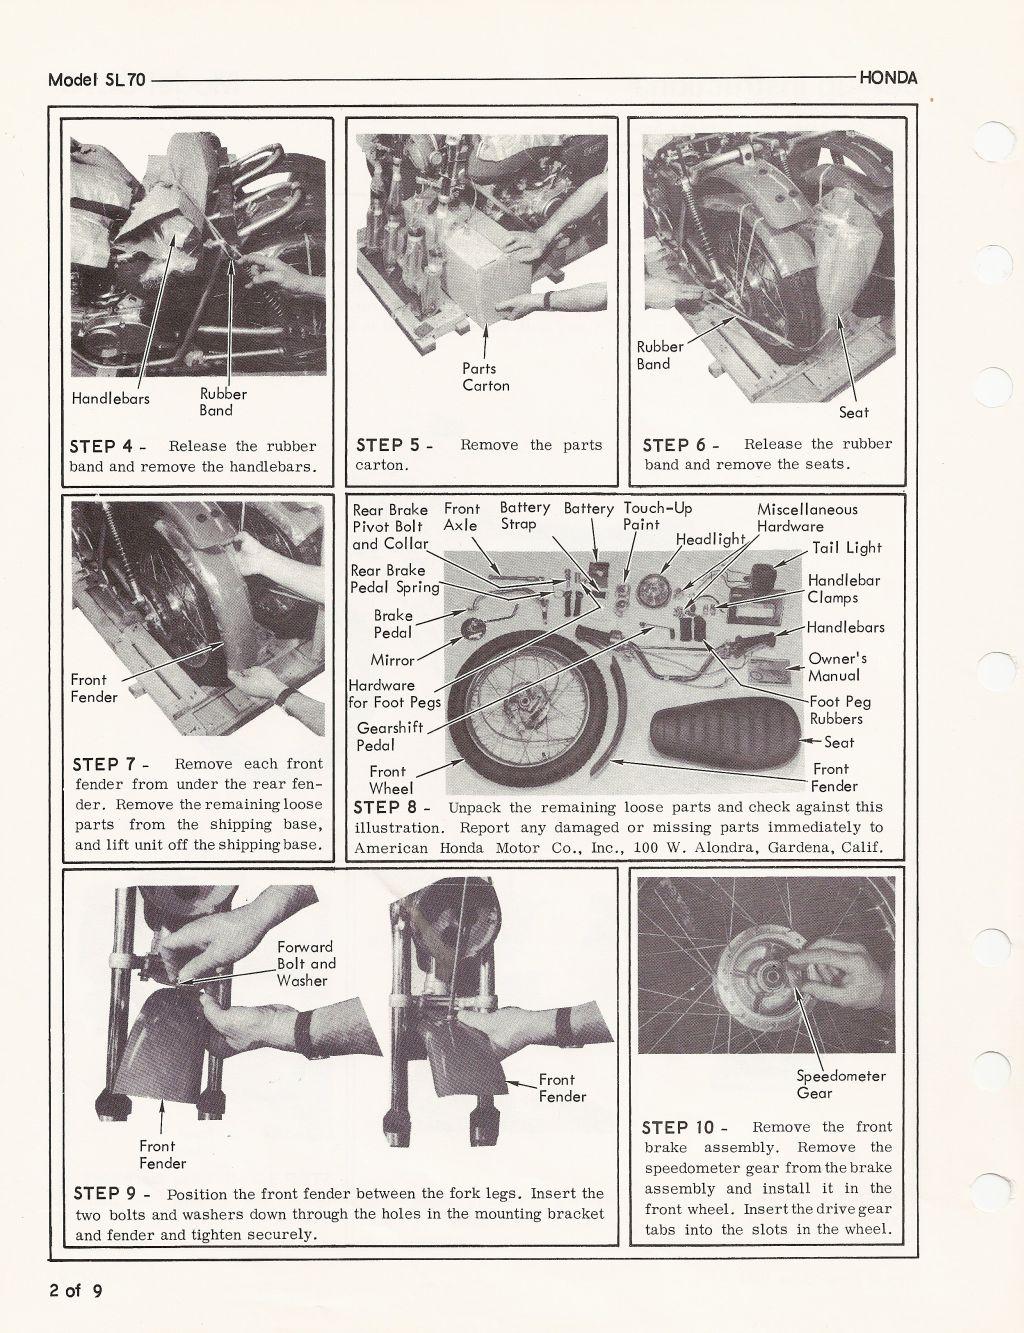 honda sl70 wiring diagram wiring diagrams cheap Honda XL 250 1994 Carb